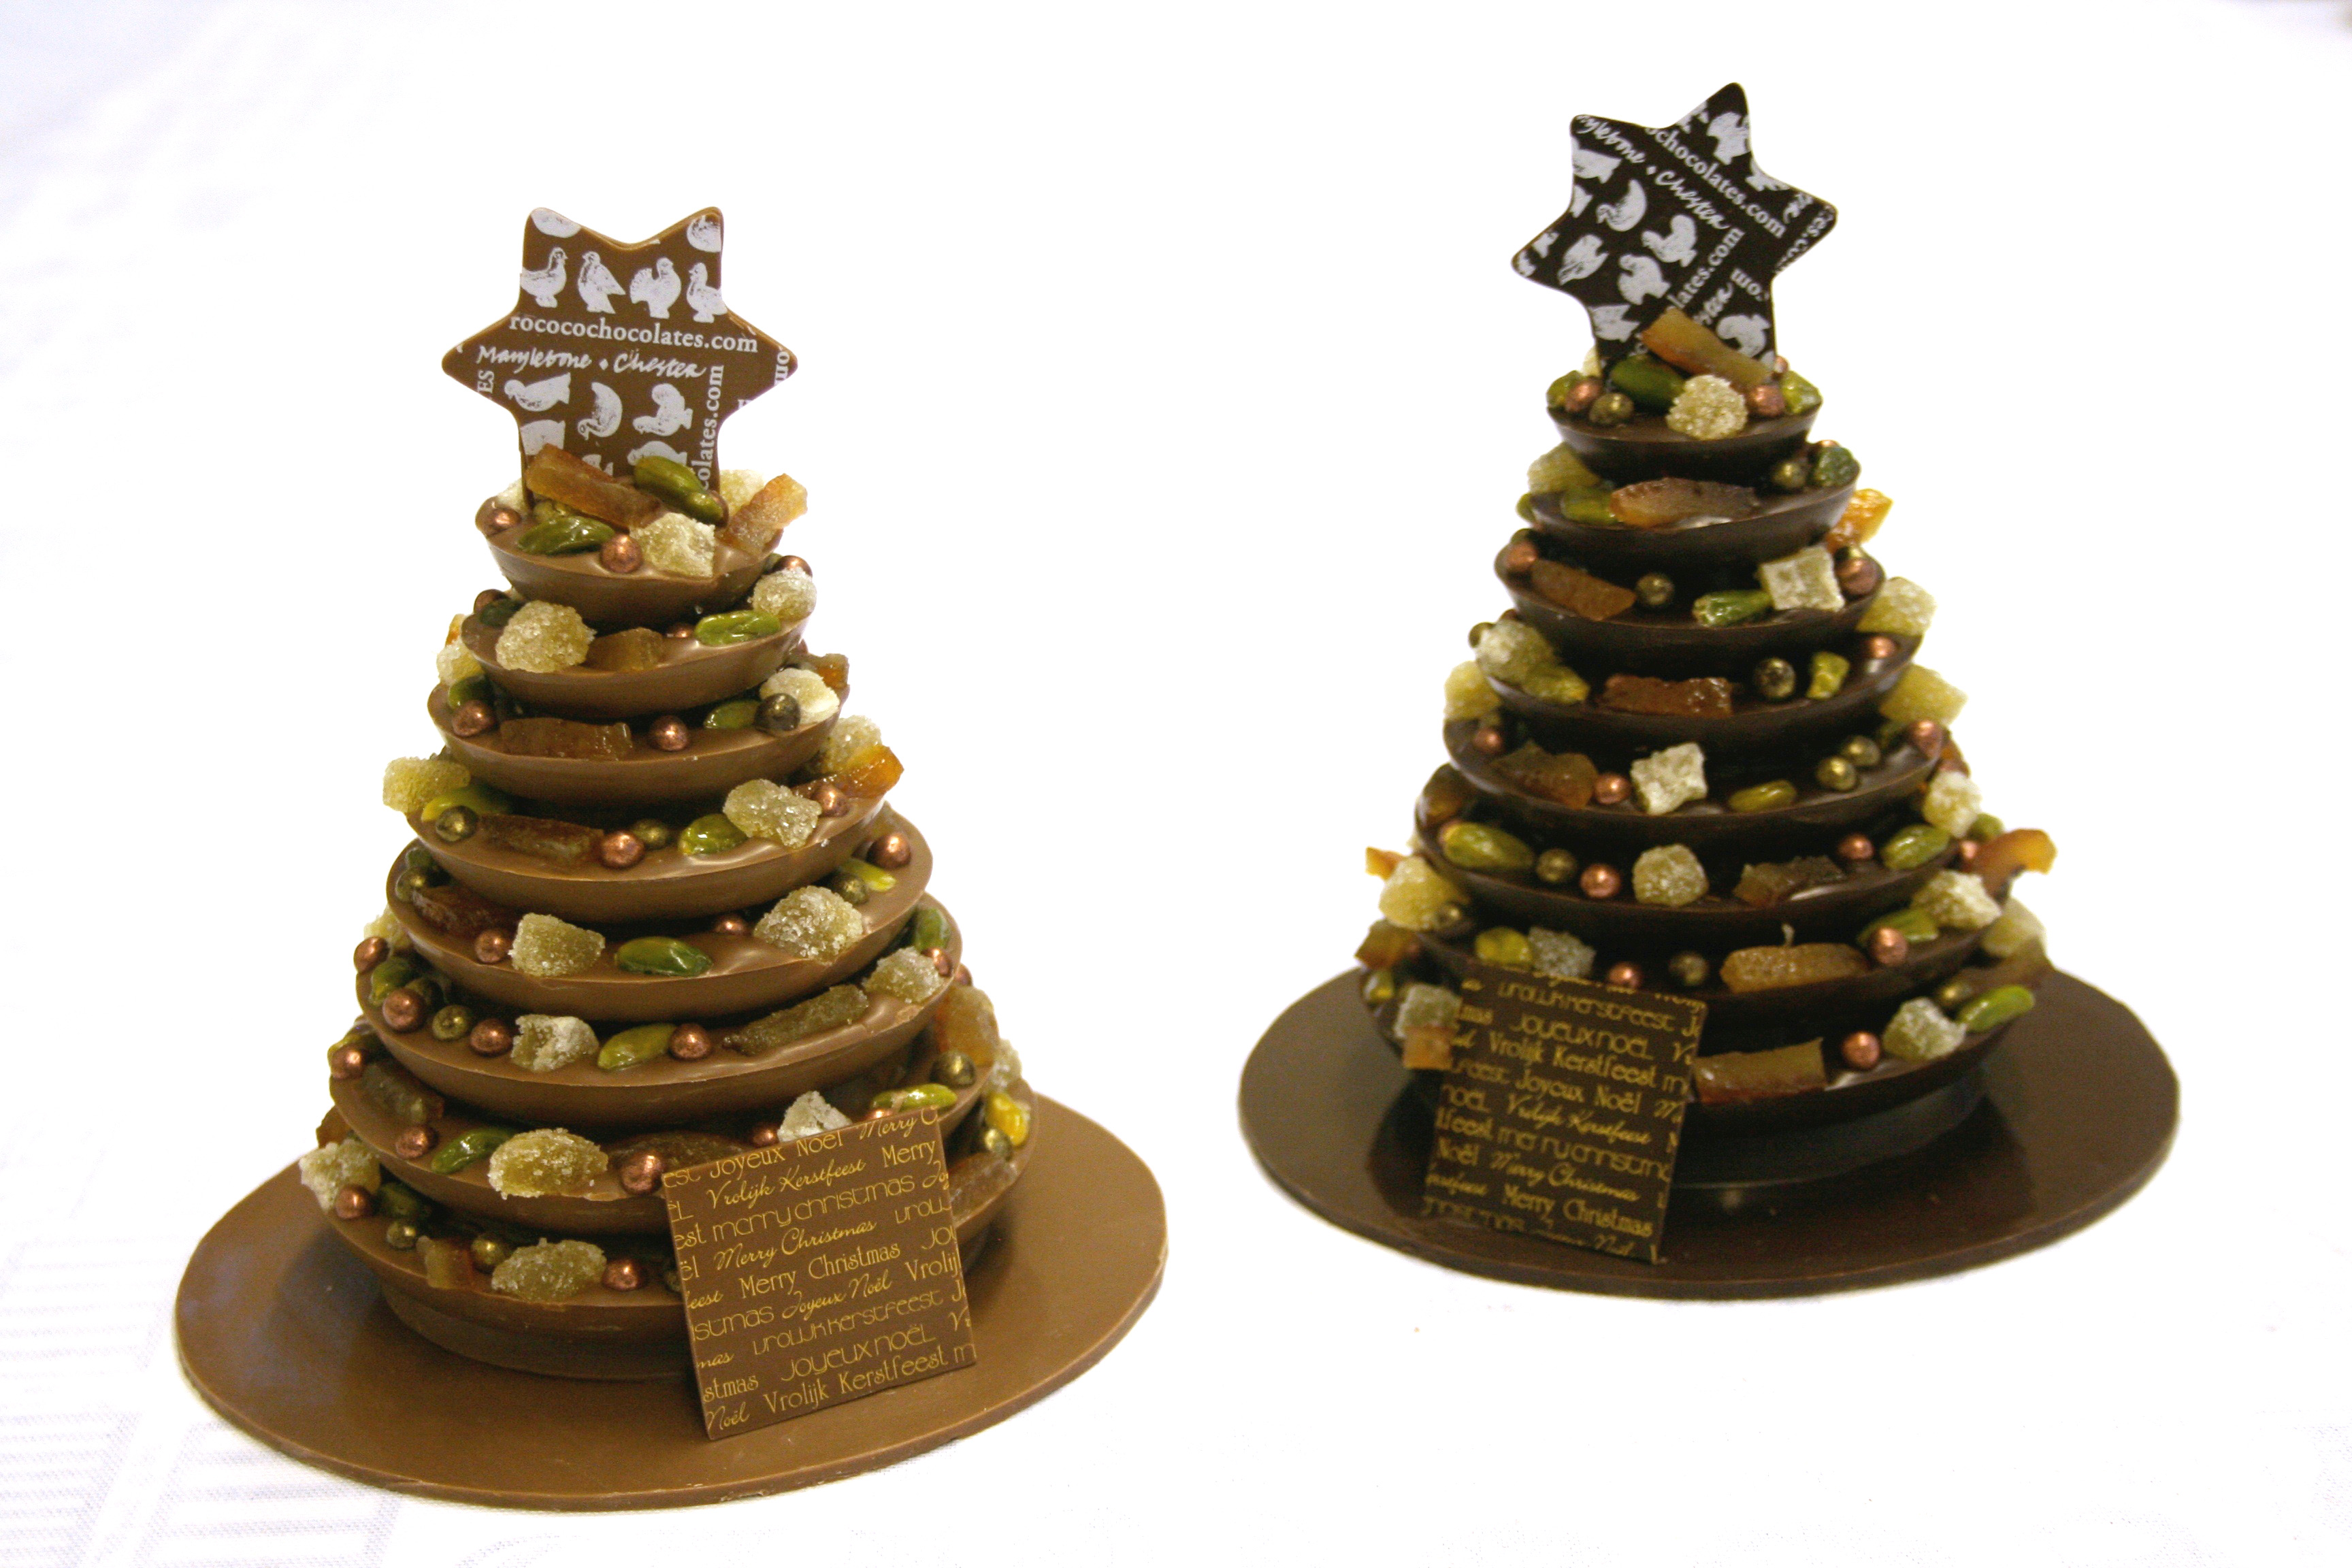 Chocolate Christmas Tree Decorations Asda : Chocolate christmas tree ecofren health beauty community